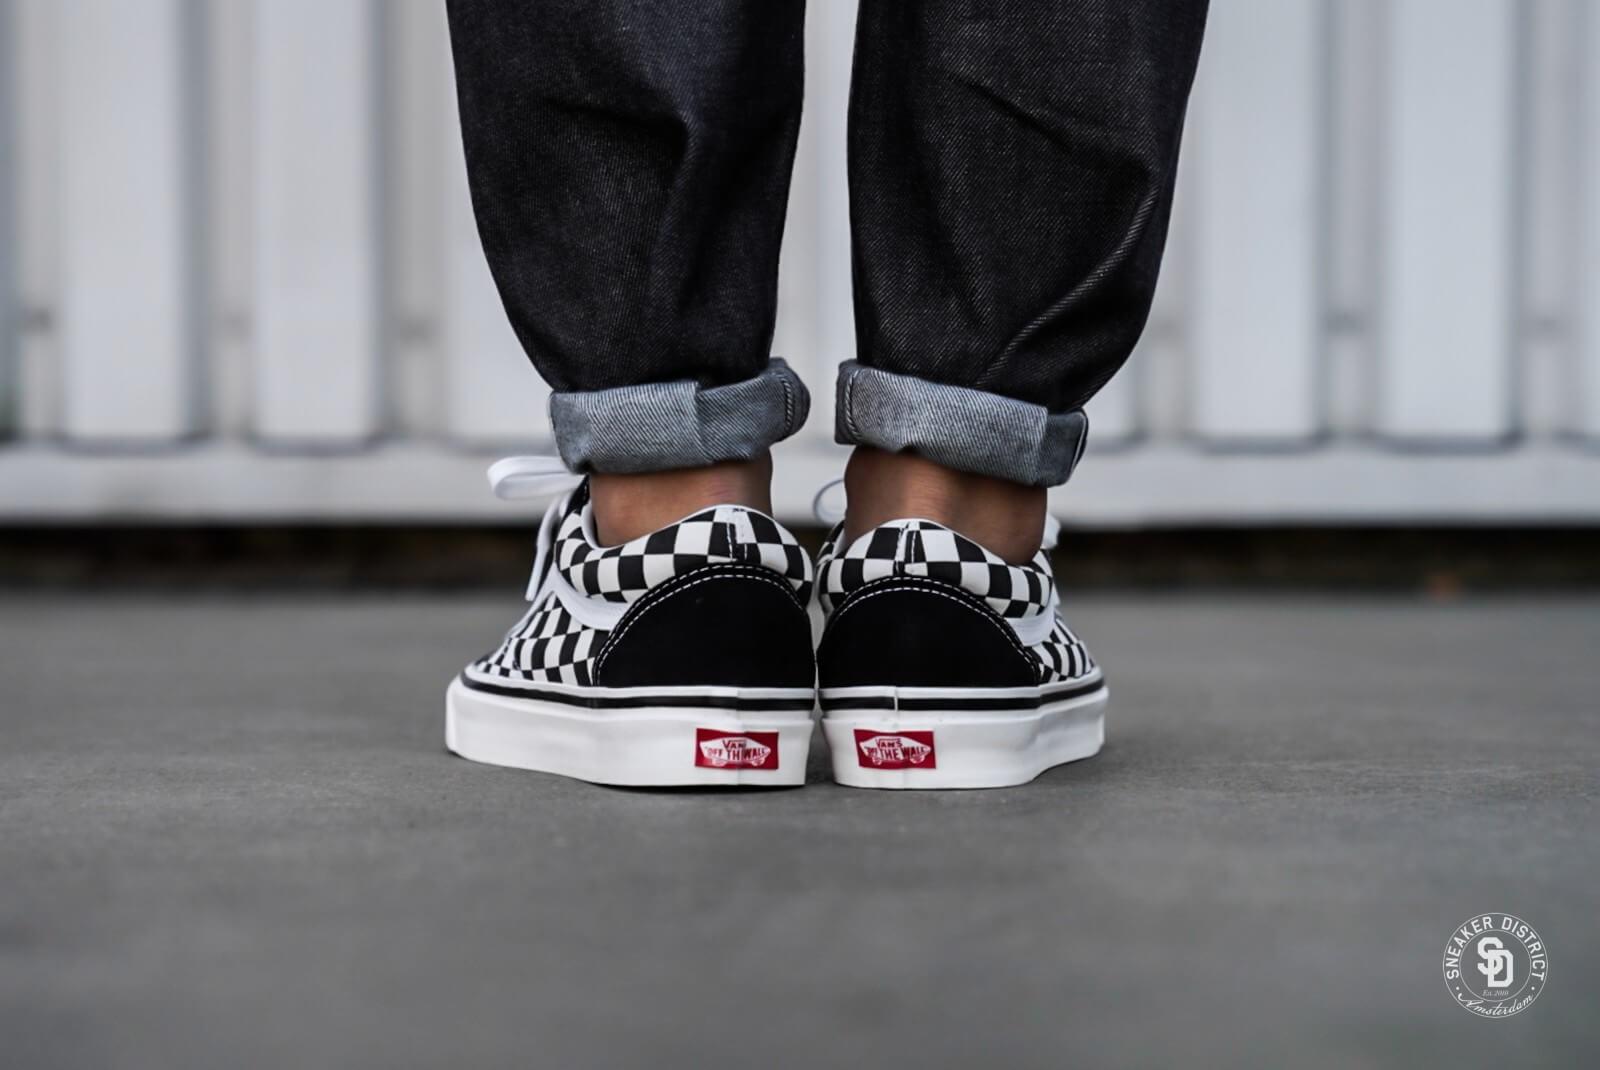 Vans Old Skool 36 DX Anaheim Factory Black Checkerboard VN0A38G2OAK